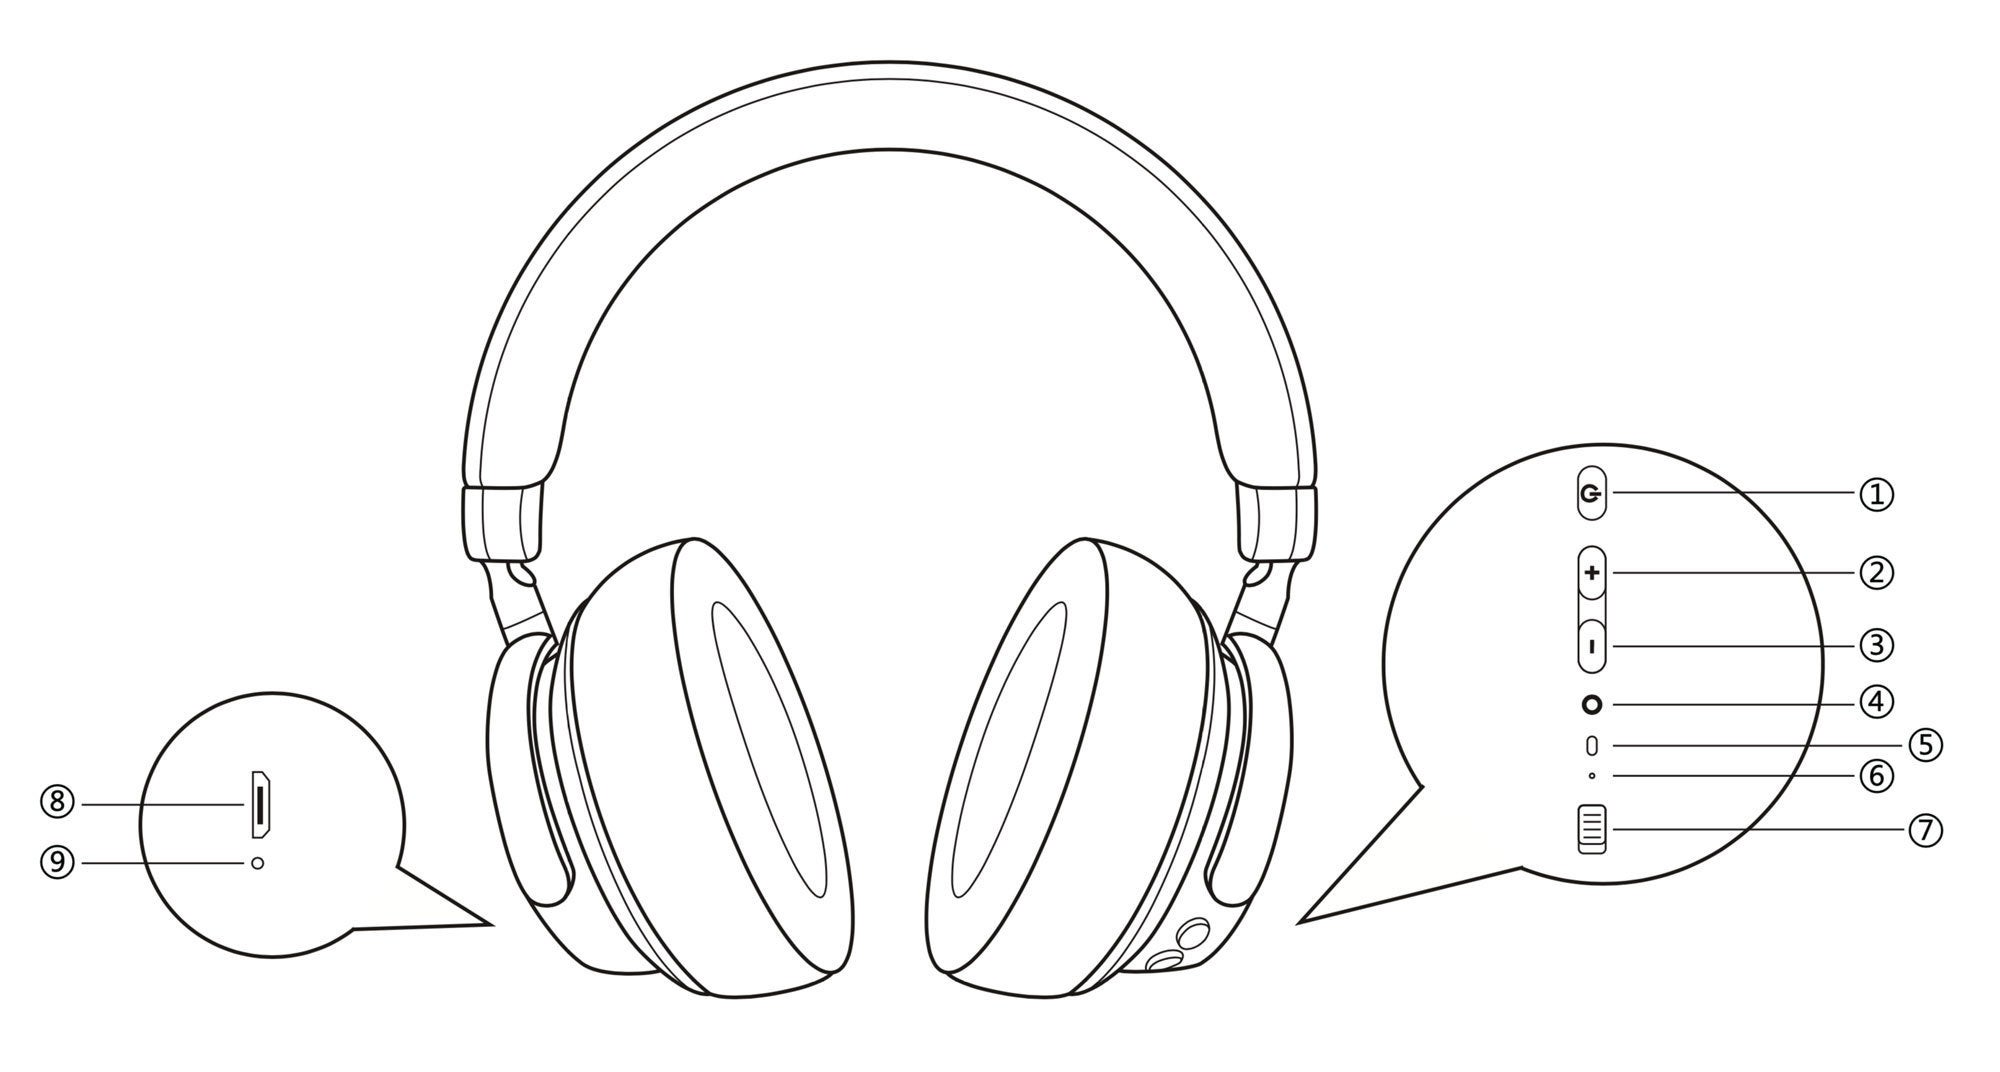 Taotronics Tt Bh046 Noise Cancelling Headphone Review